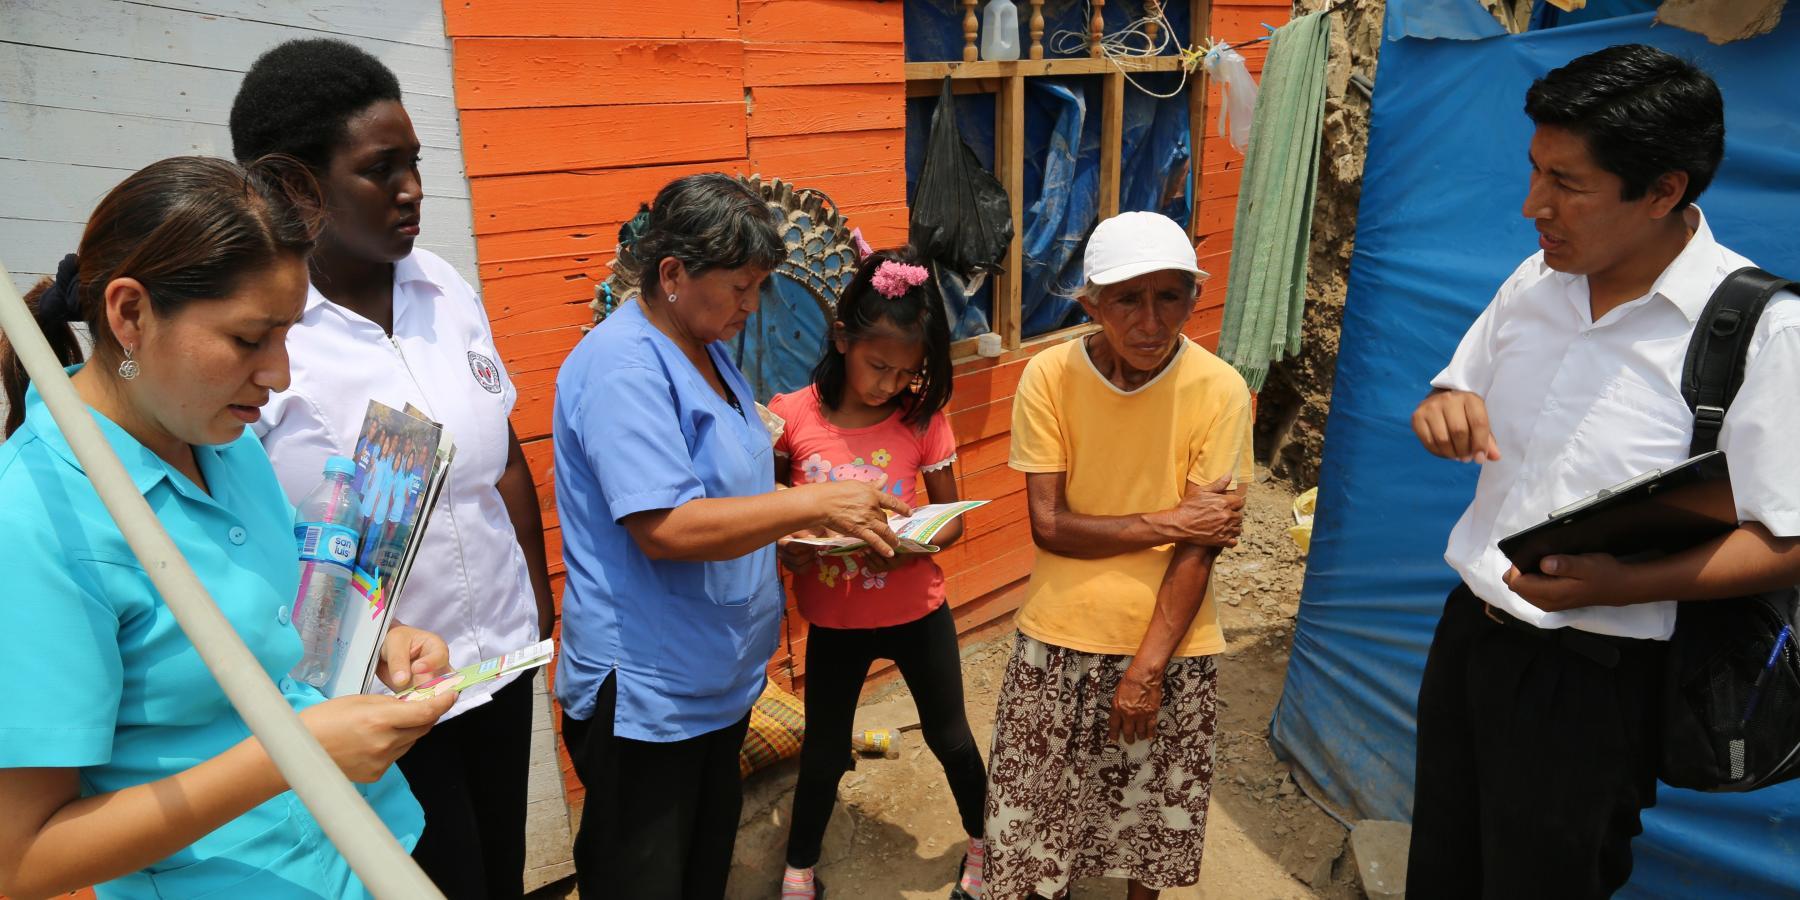 Peru: Respiratory conditions